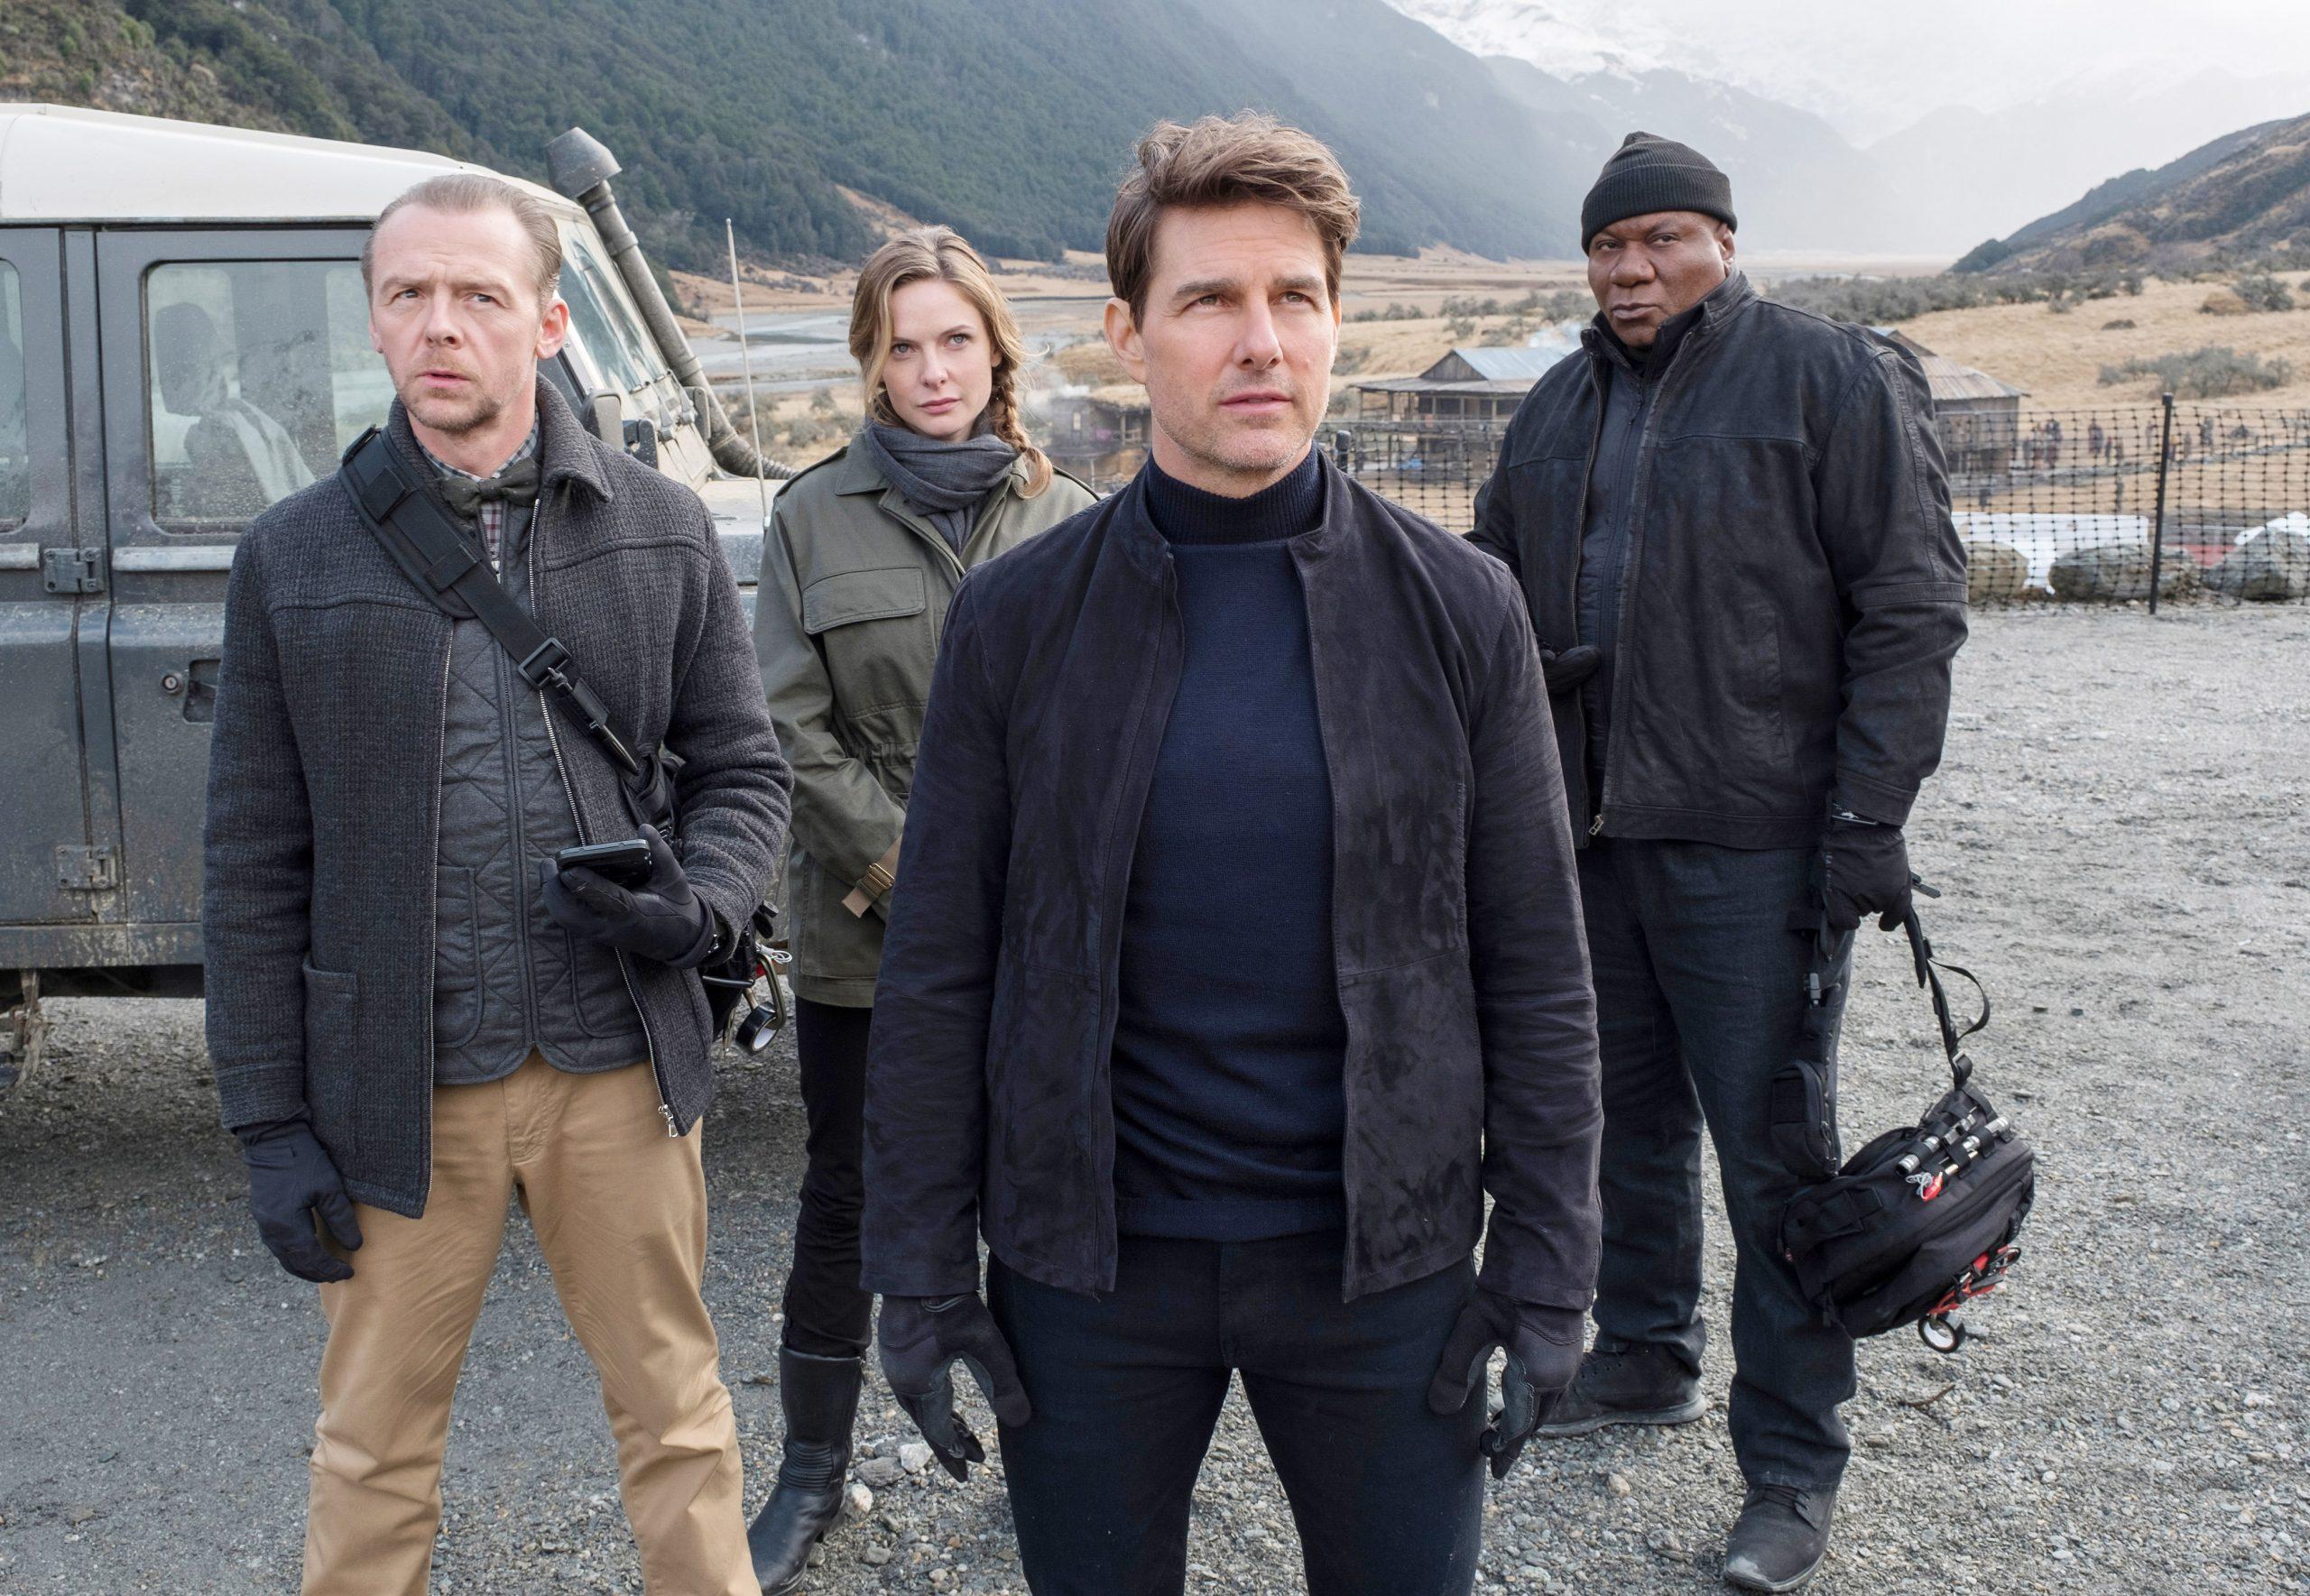 'Mission: Impossible' Sets Sequels For Summer 2021, 2022 Intended For Men On A Mission 2021 Calendar